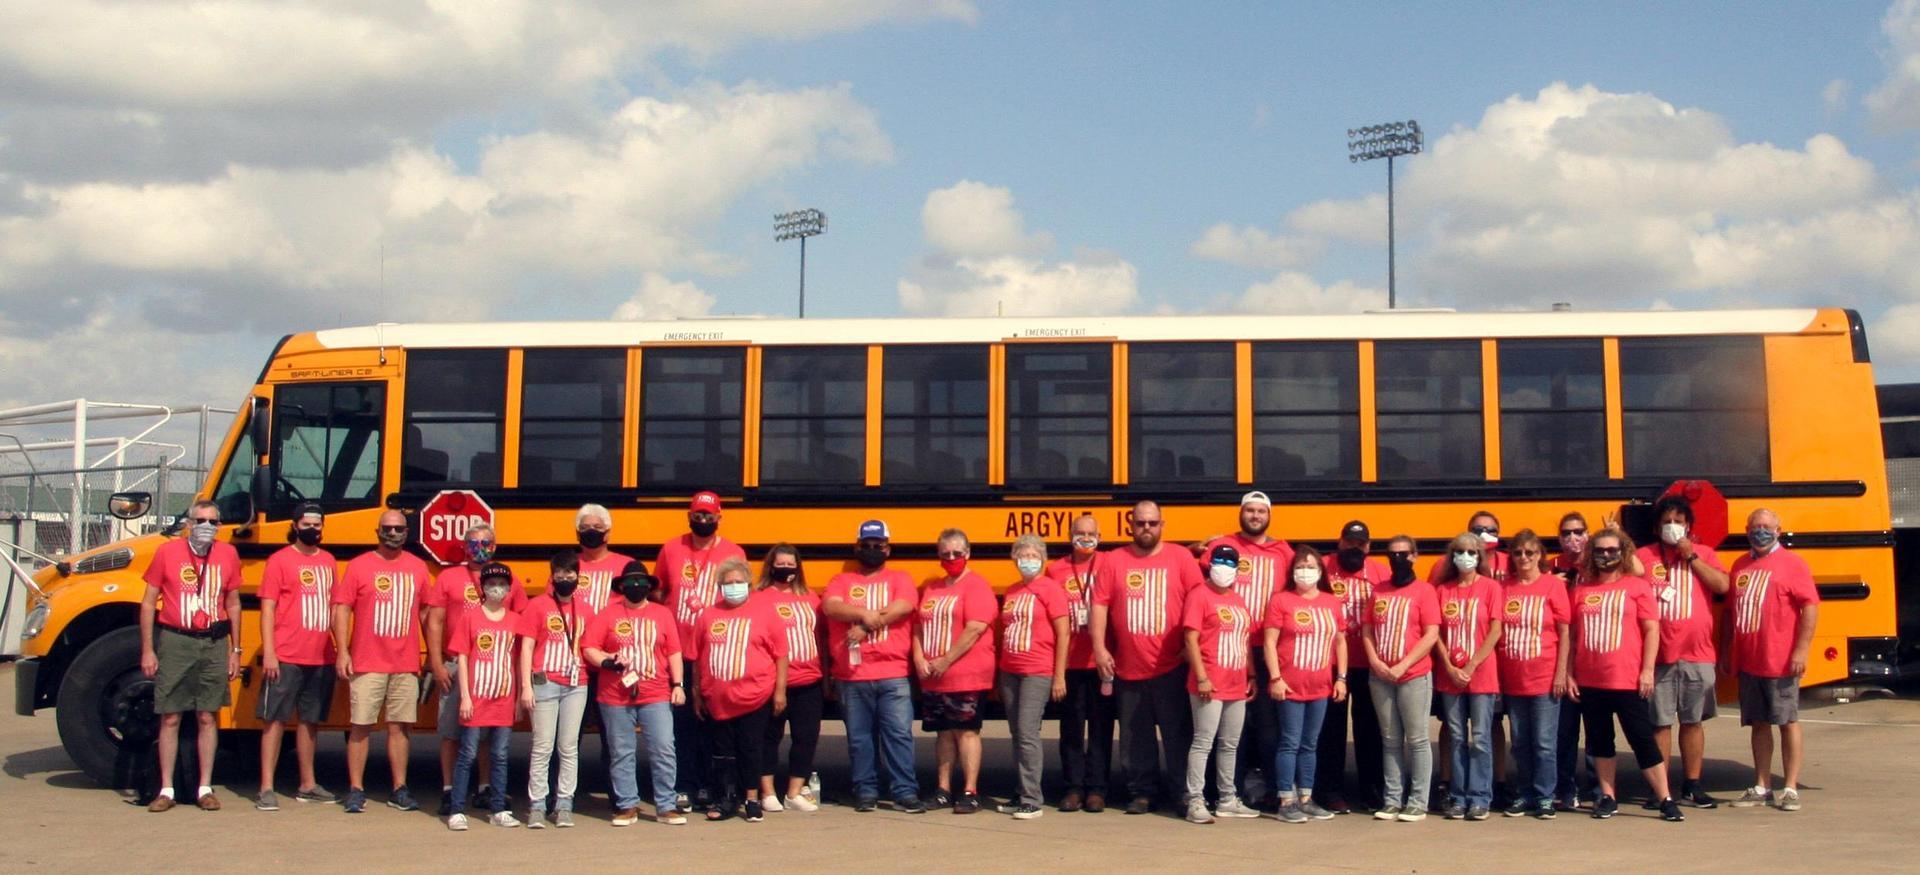 Transportation group photo